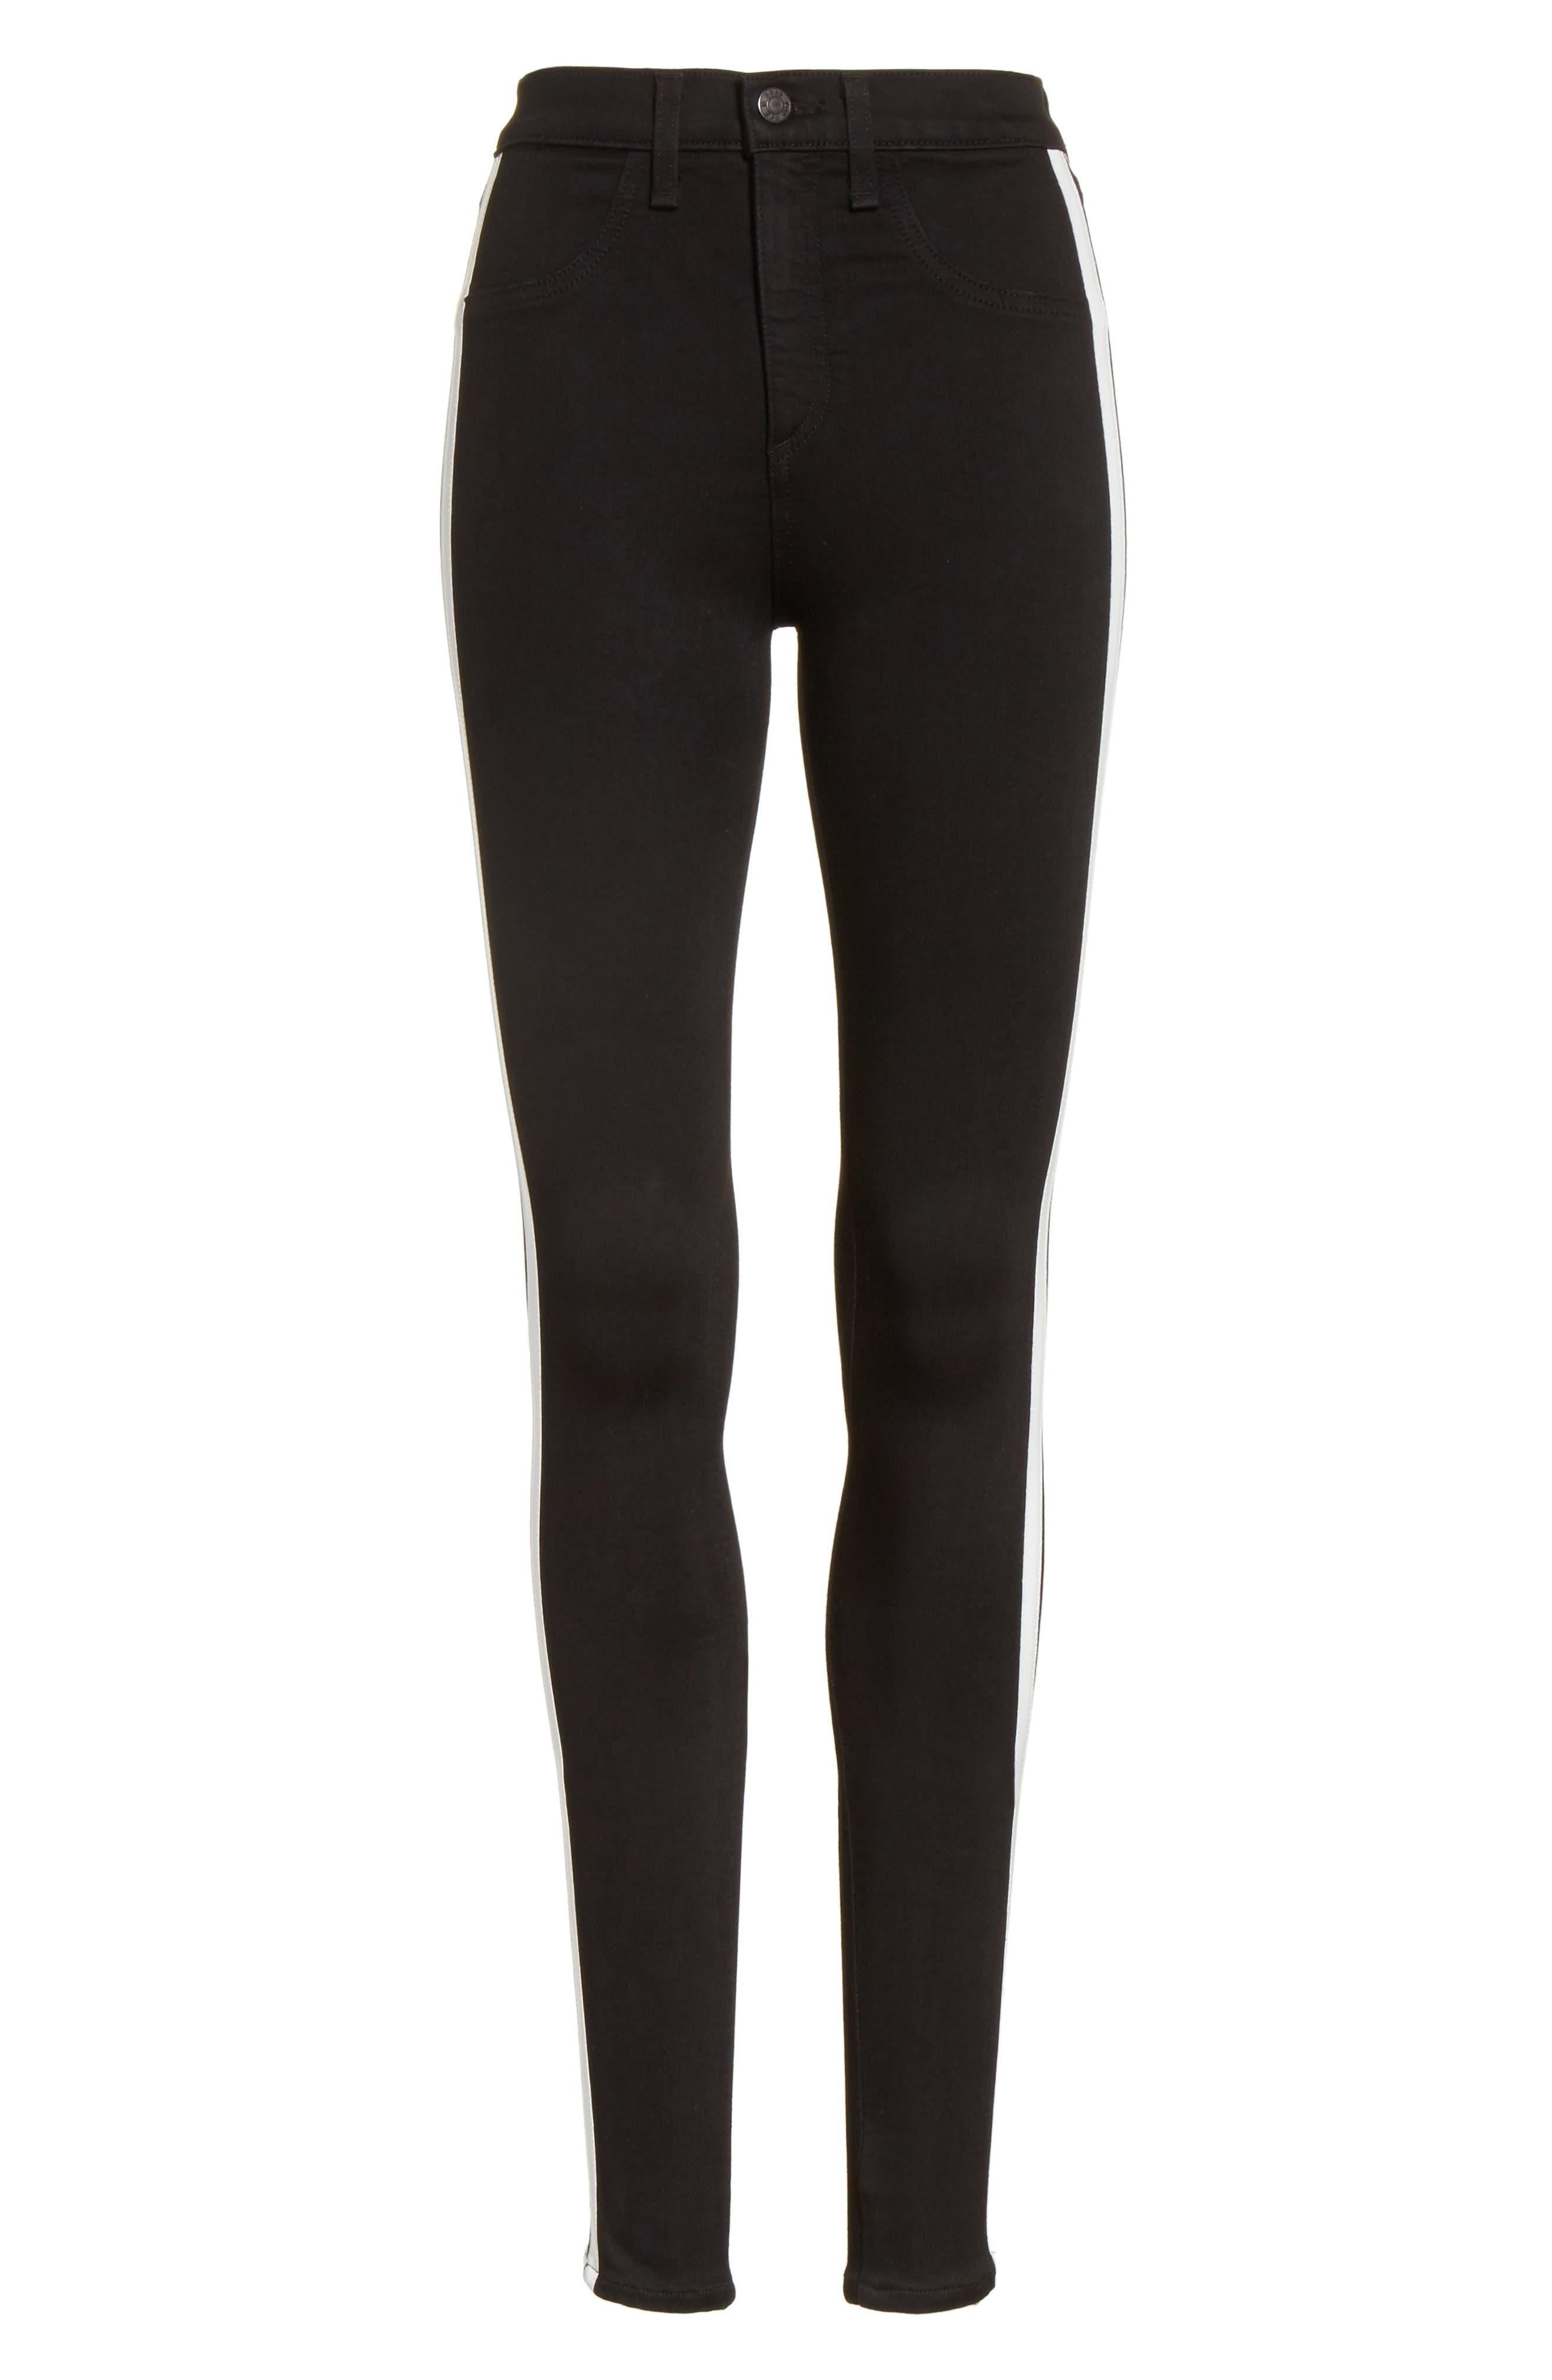 Mito High Waist Skinny Jeans,                             Alternate thumbnail 6, color,                             Black